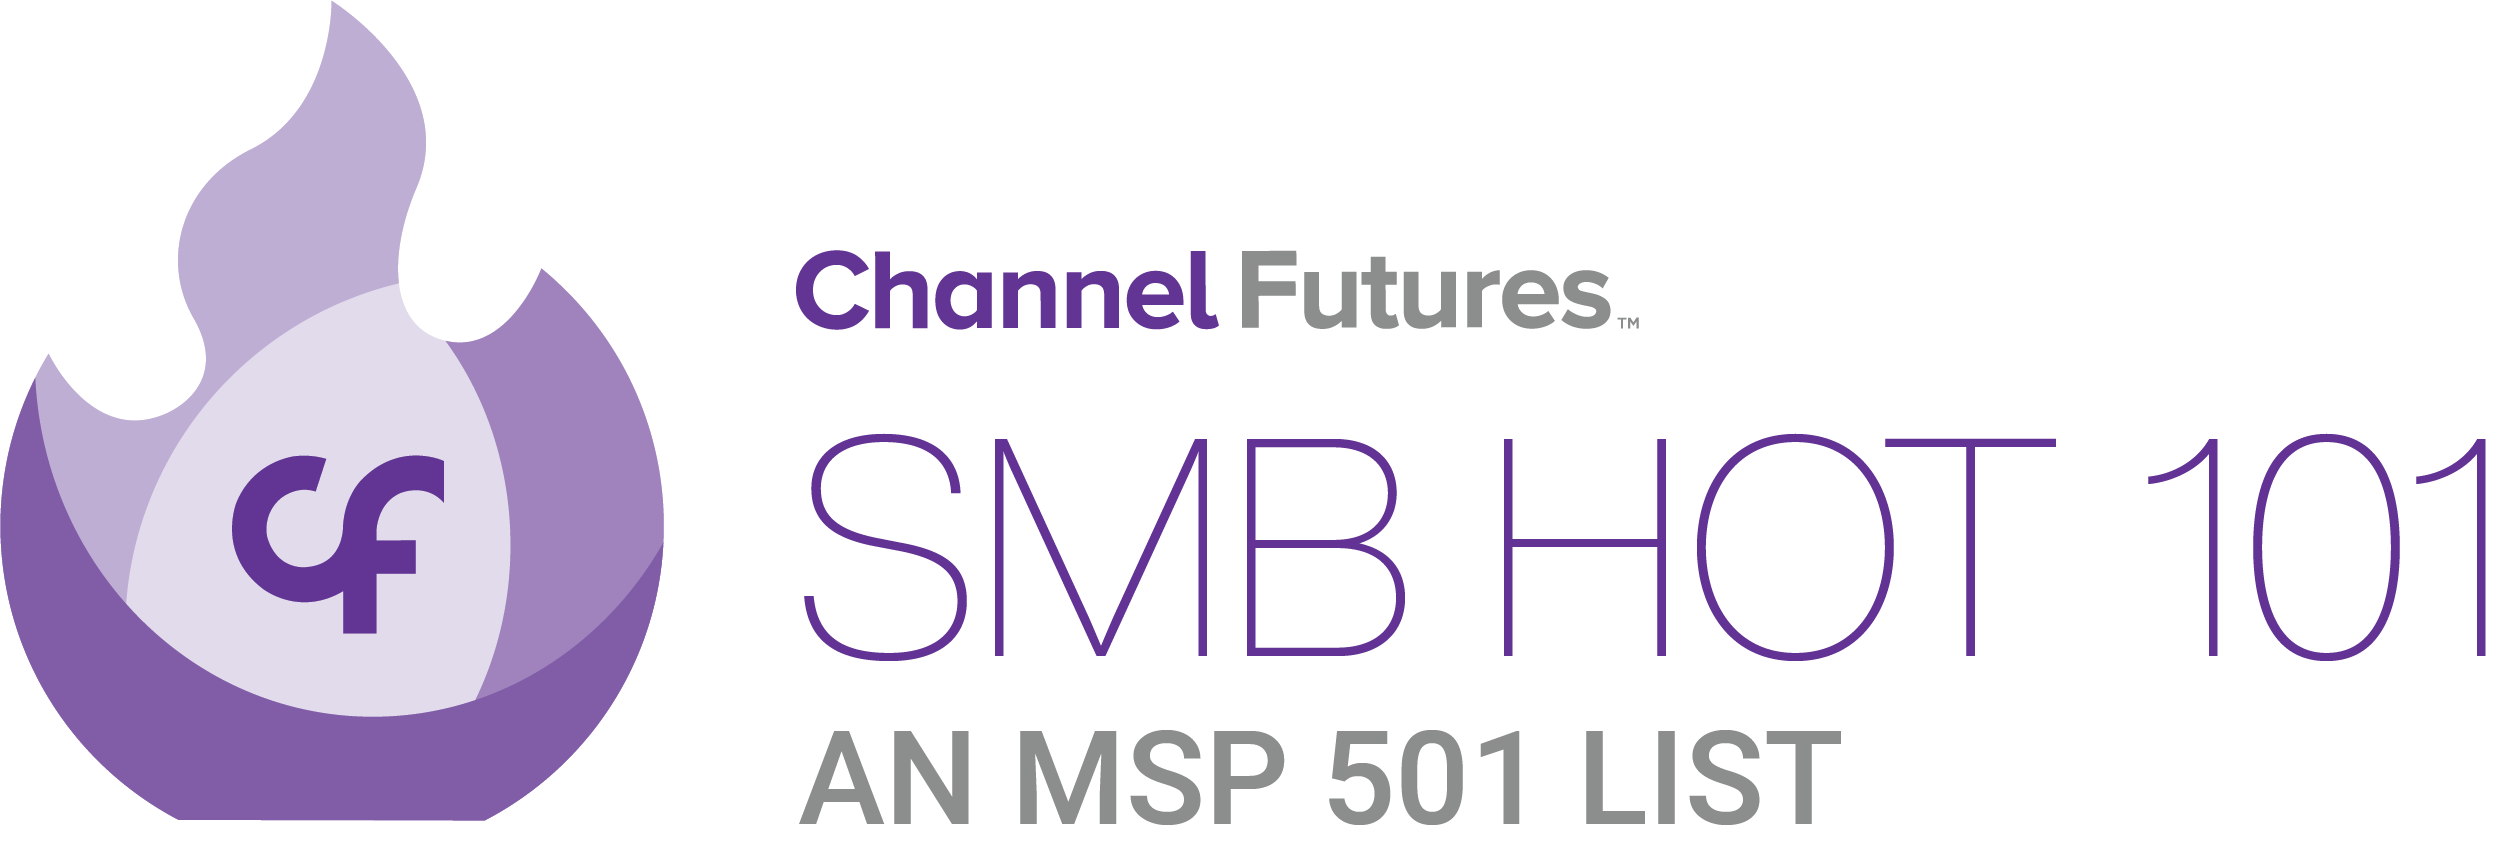 SMB-Hot-101-Logo-1